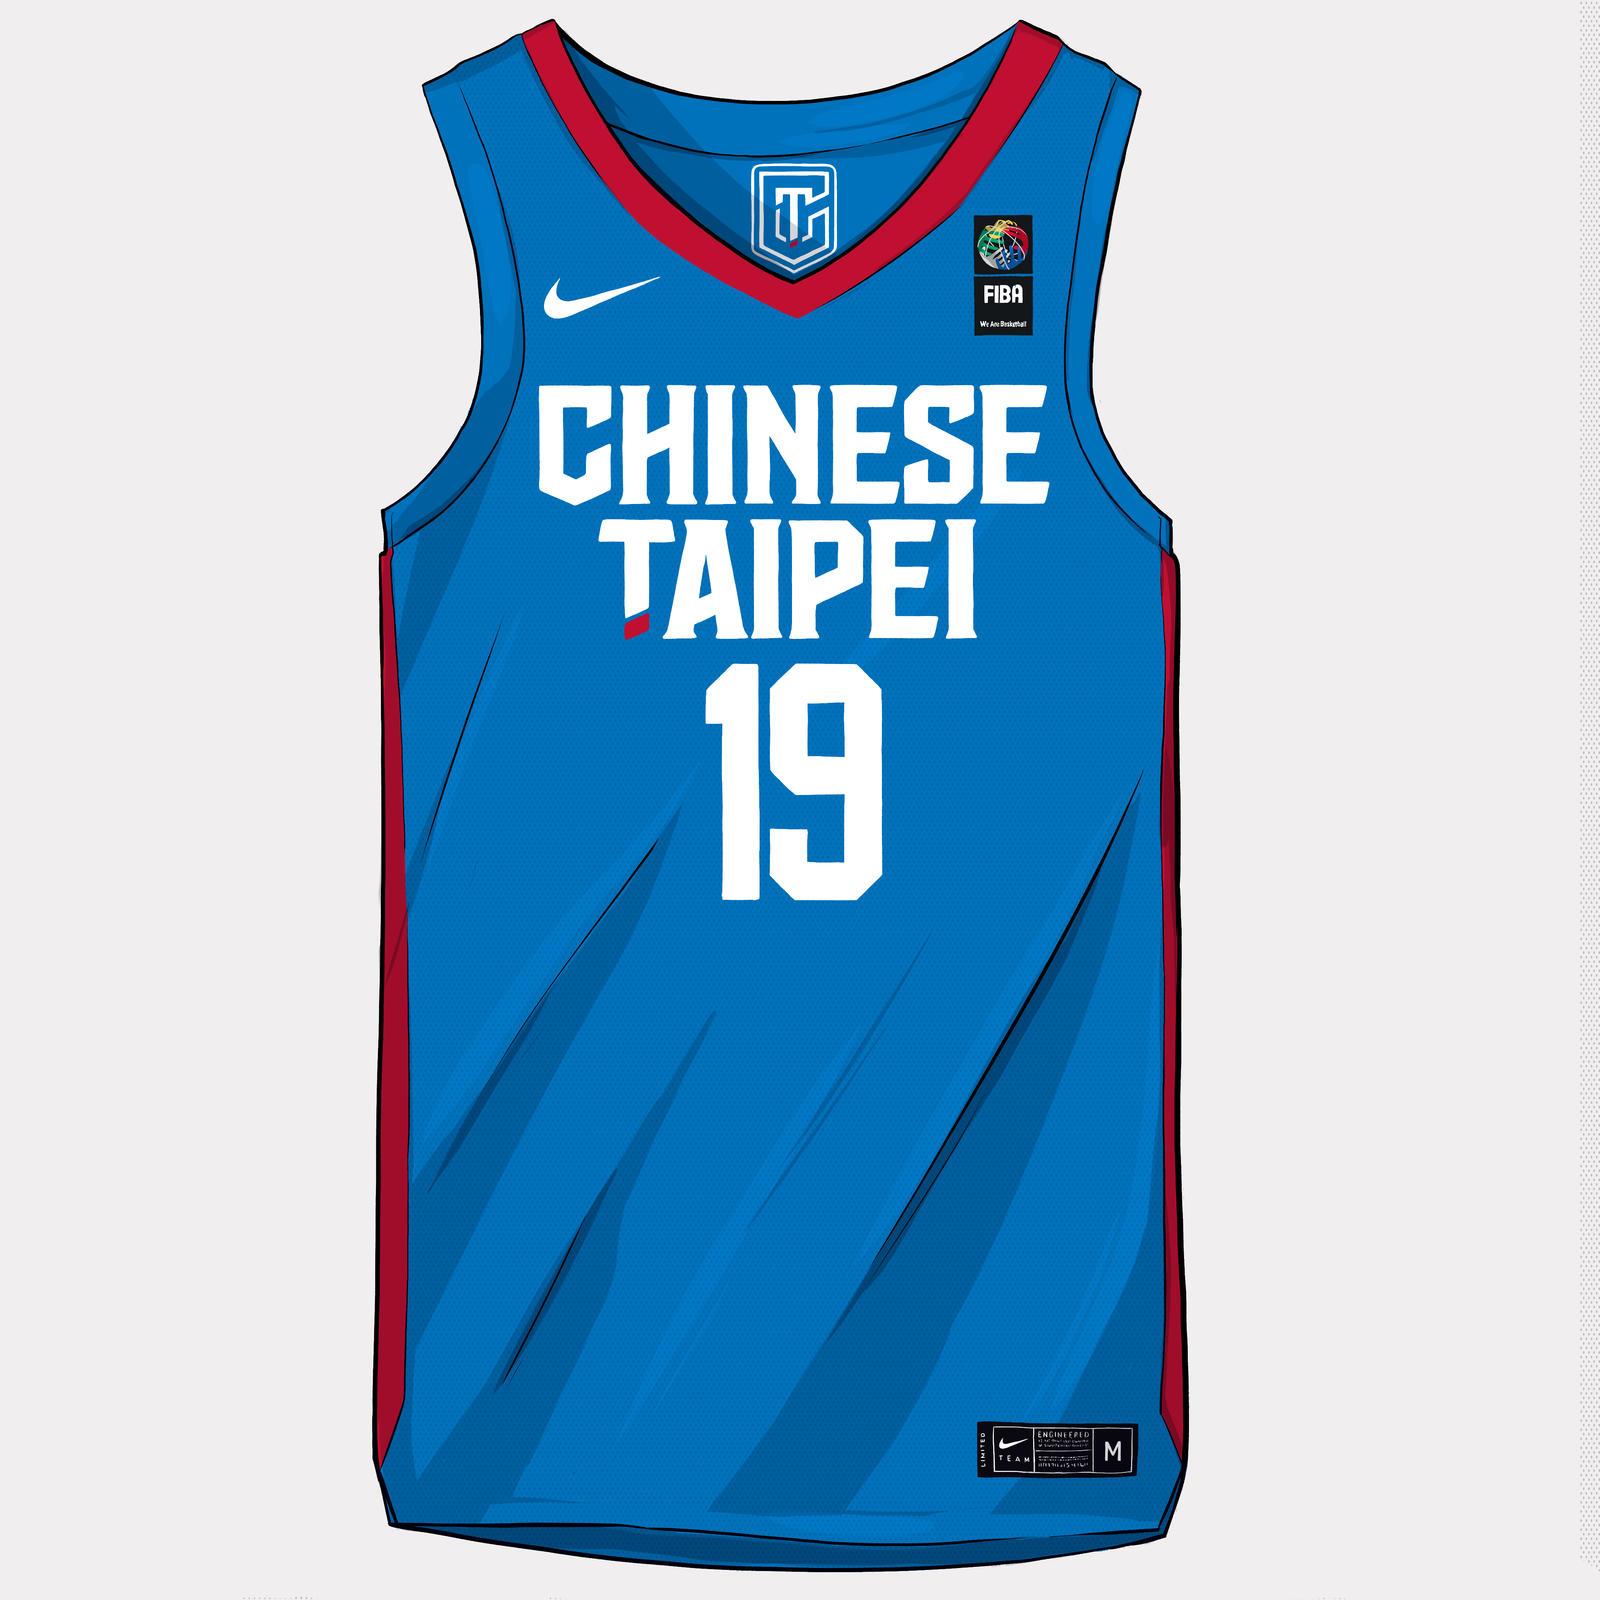 nike-news-chinese-taipei-national-team-kit-2019-illustration-1x1_1_89515.jpg